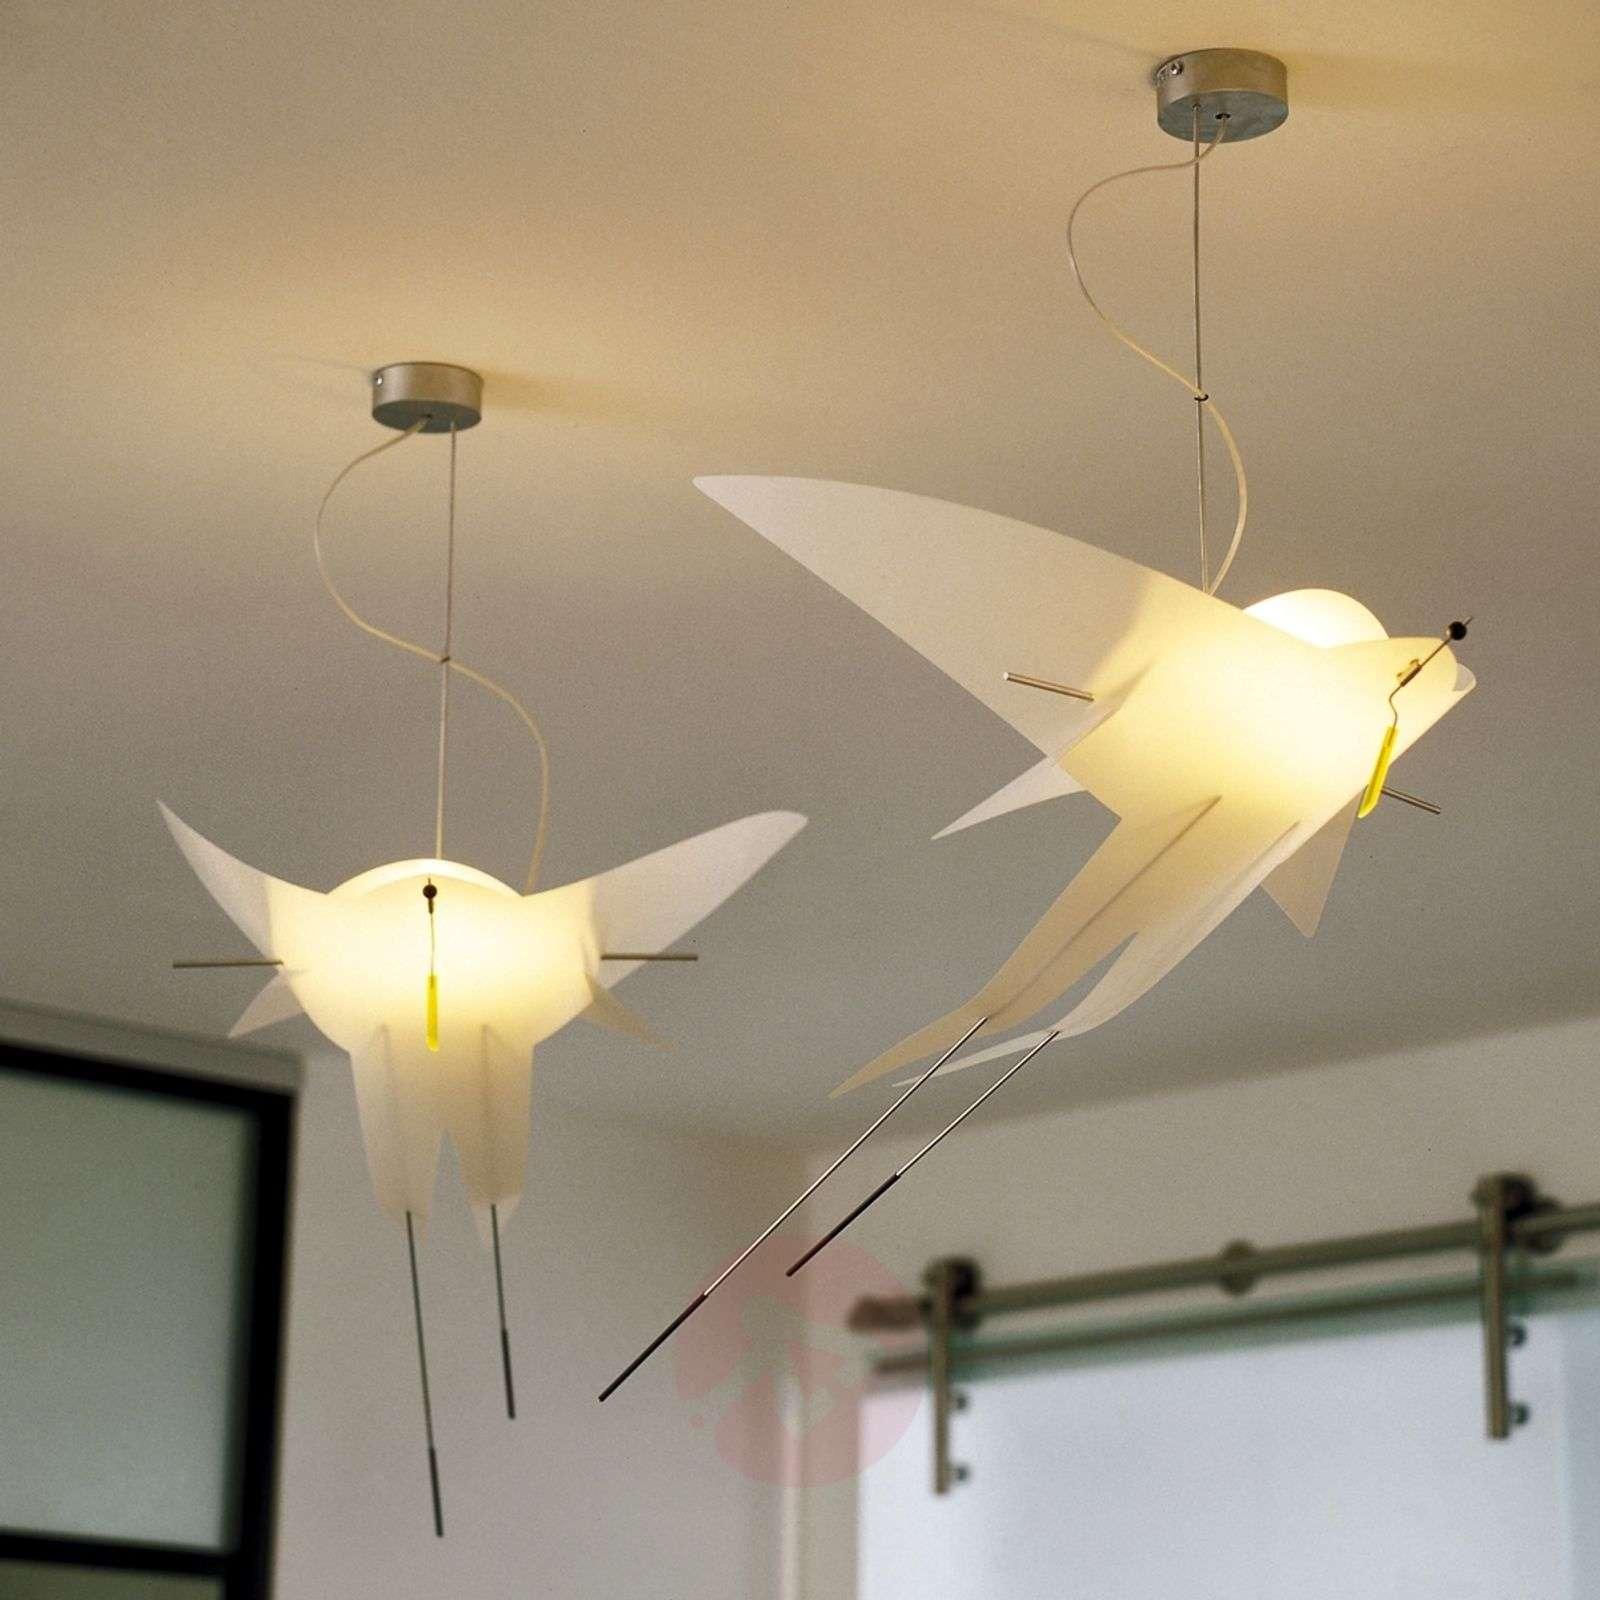 unusual ceiling lighting. Beautiful Lighting Unusual Ceiling Light SIR CHARLES725004801 To Ceiling Lighting L